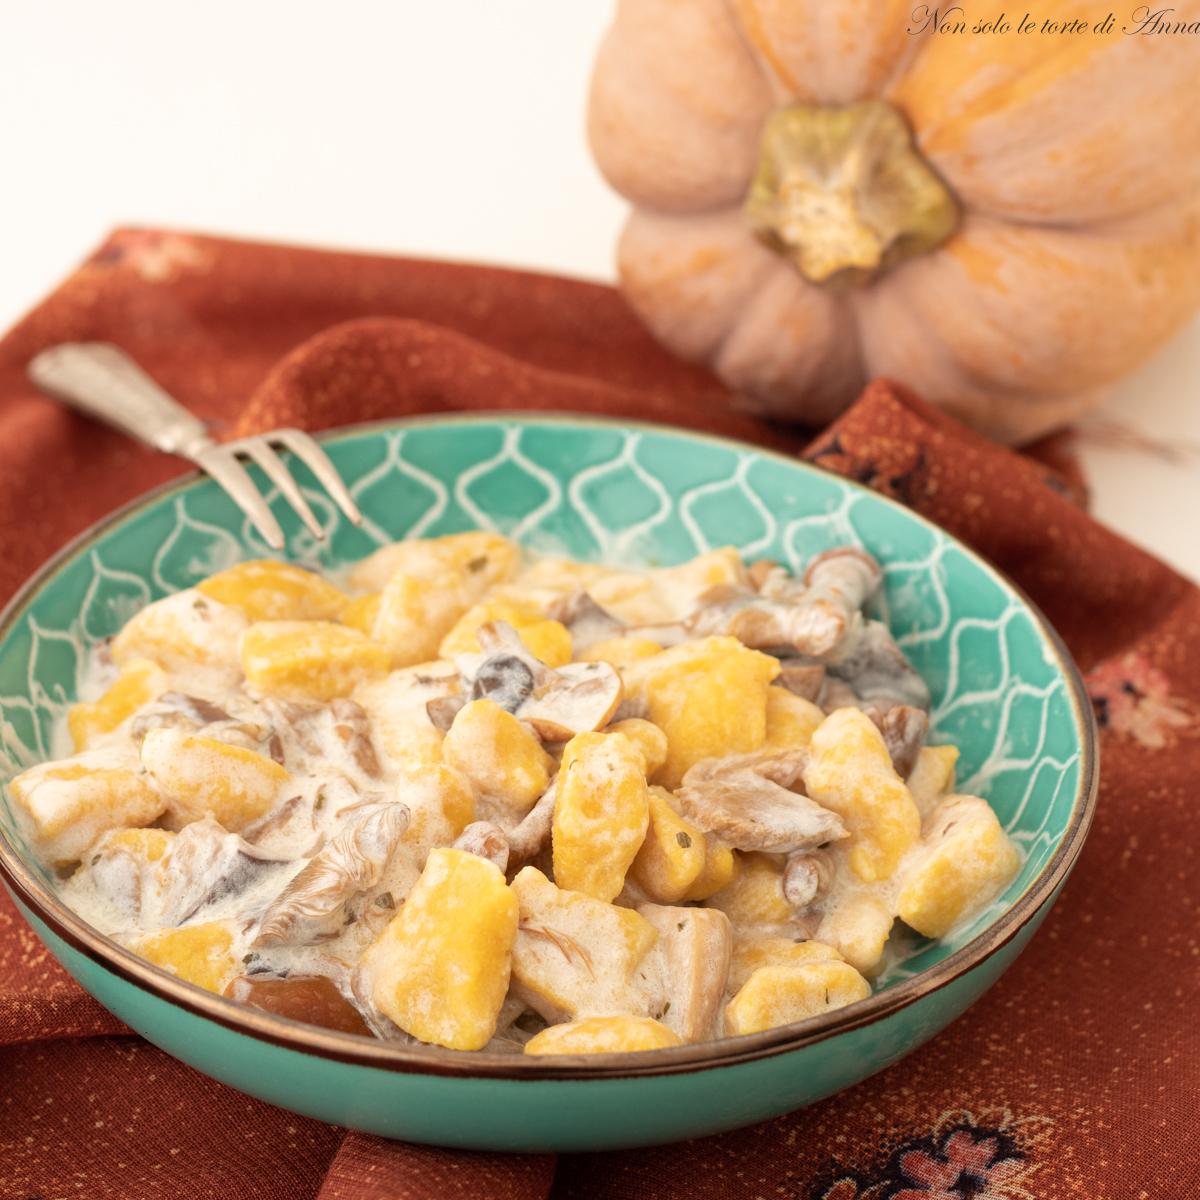 Gnocchi Walser Ricetta.Gnocchi All Ossolana Ricetta Tipica Piemontese Gnocchi Castagne E Zucca